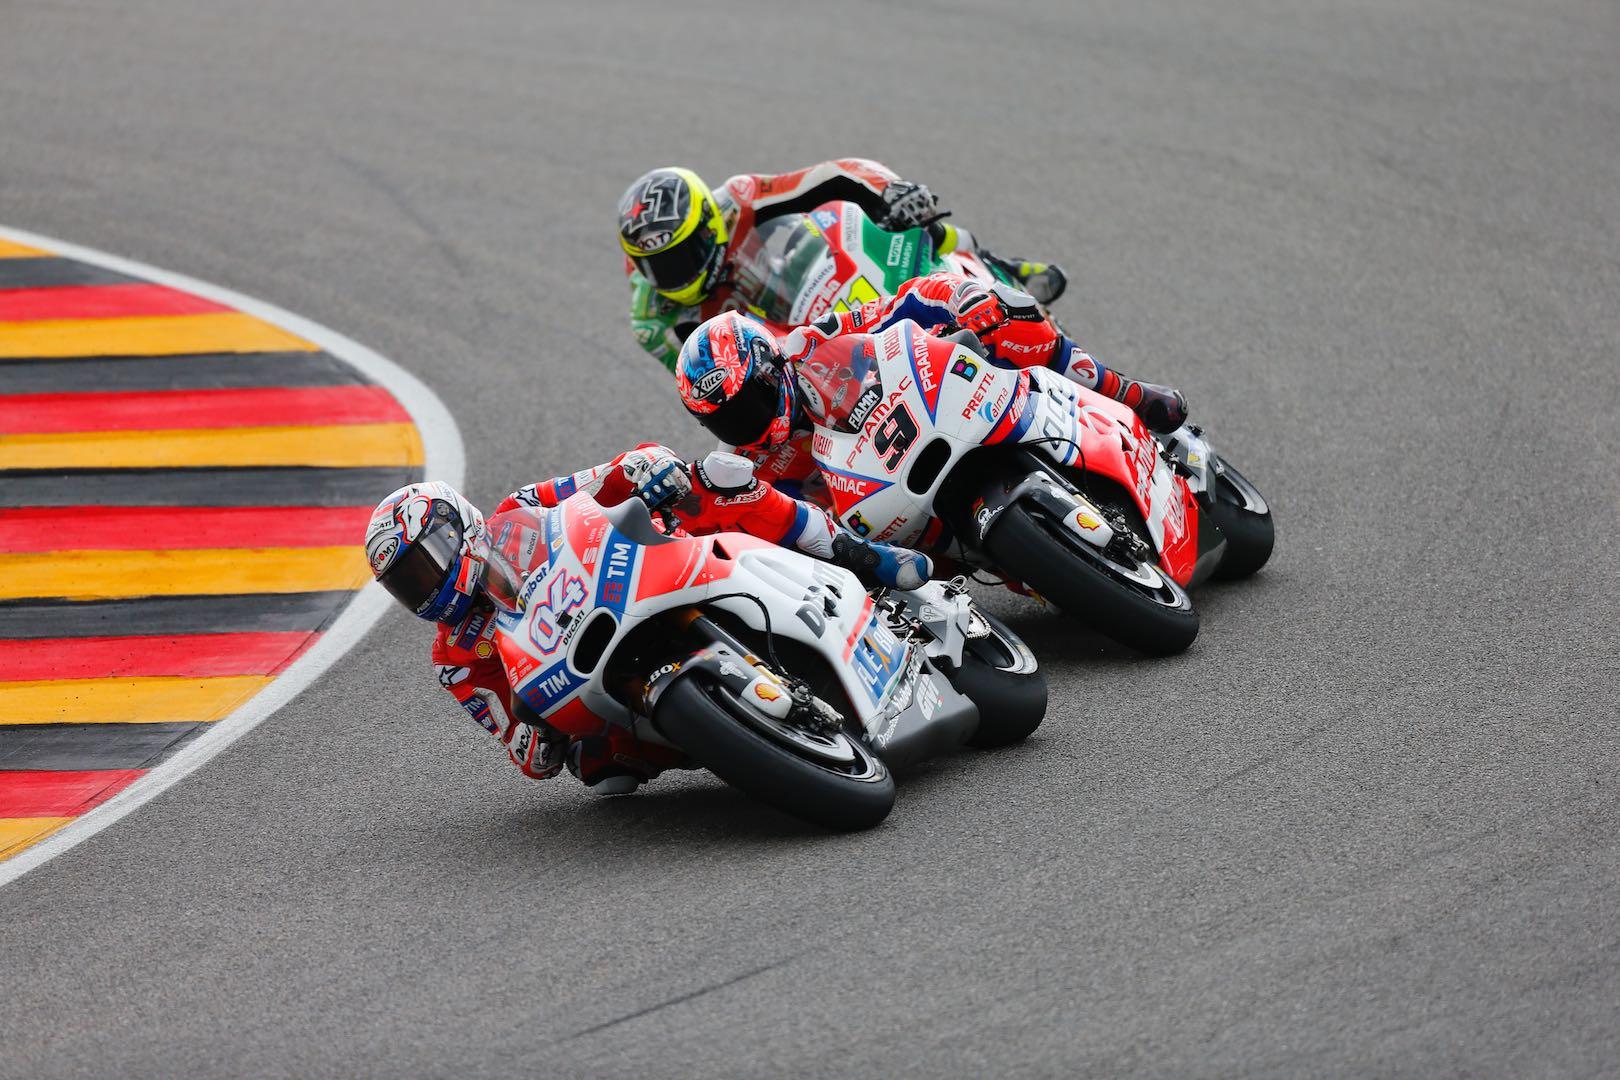 2017 Sachsenring MotoGP Results: Germany Grand Prix Results: Ducati's Andrea Dovizioso